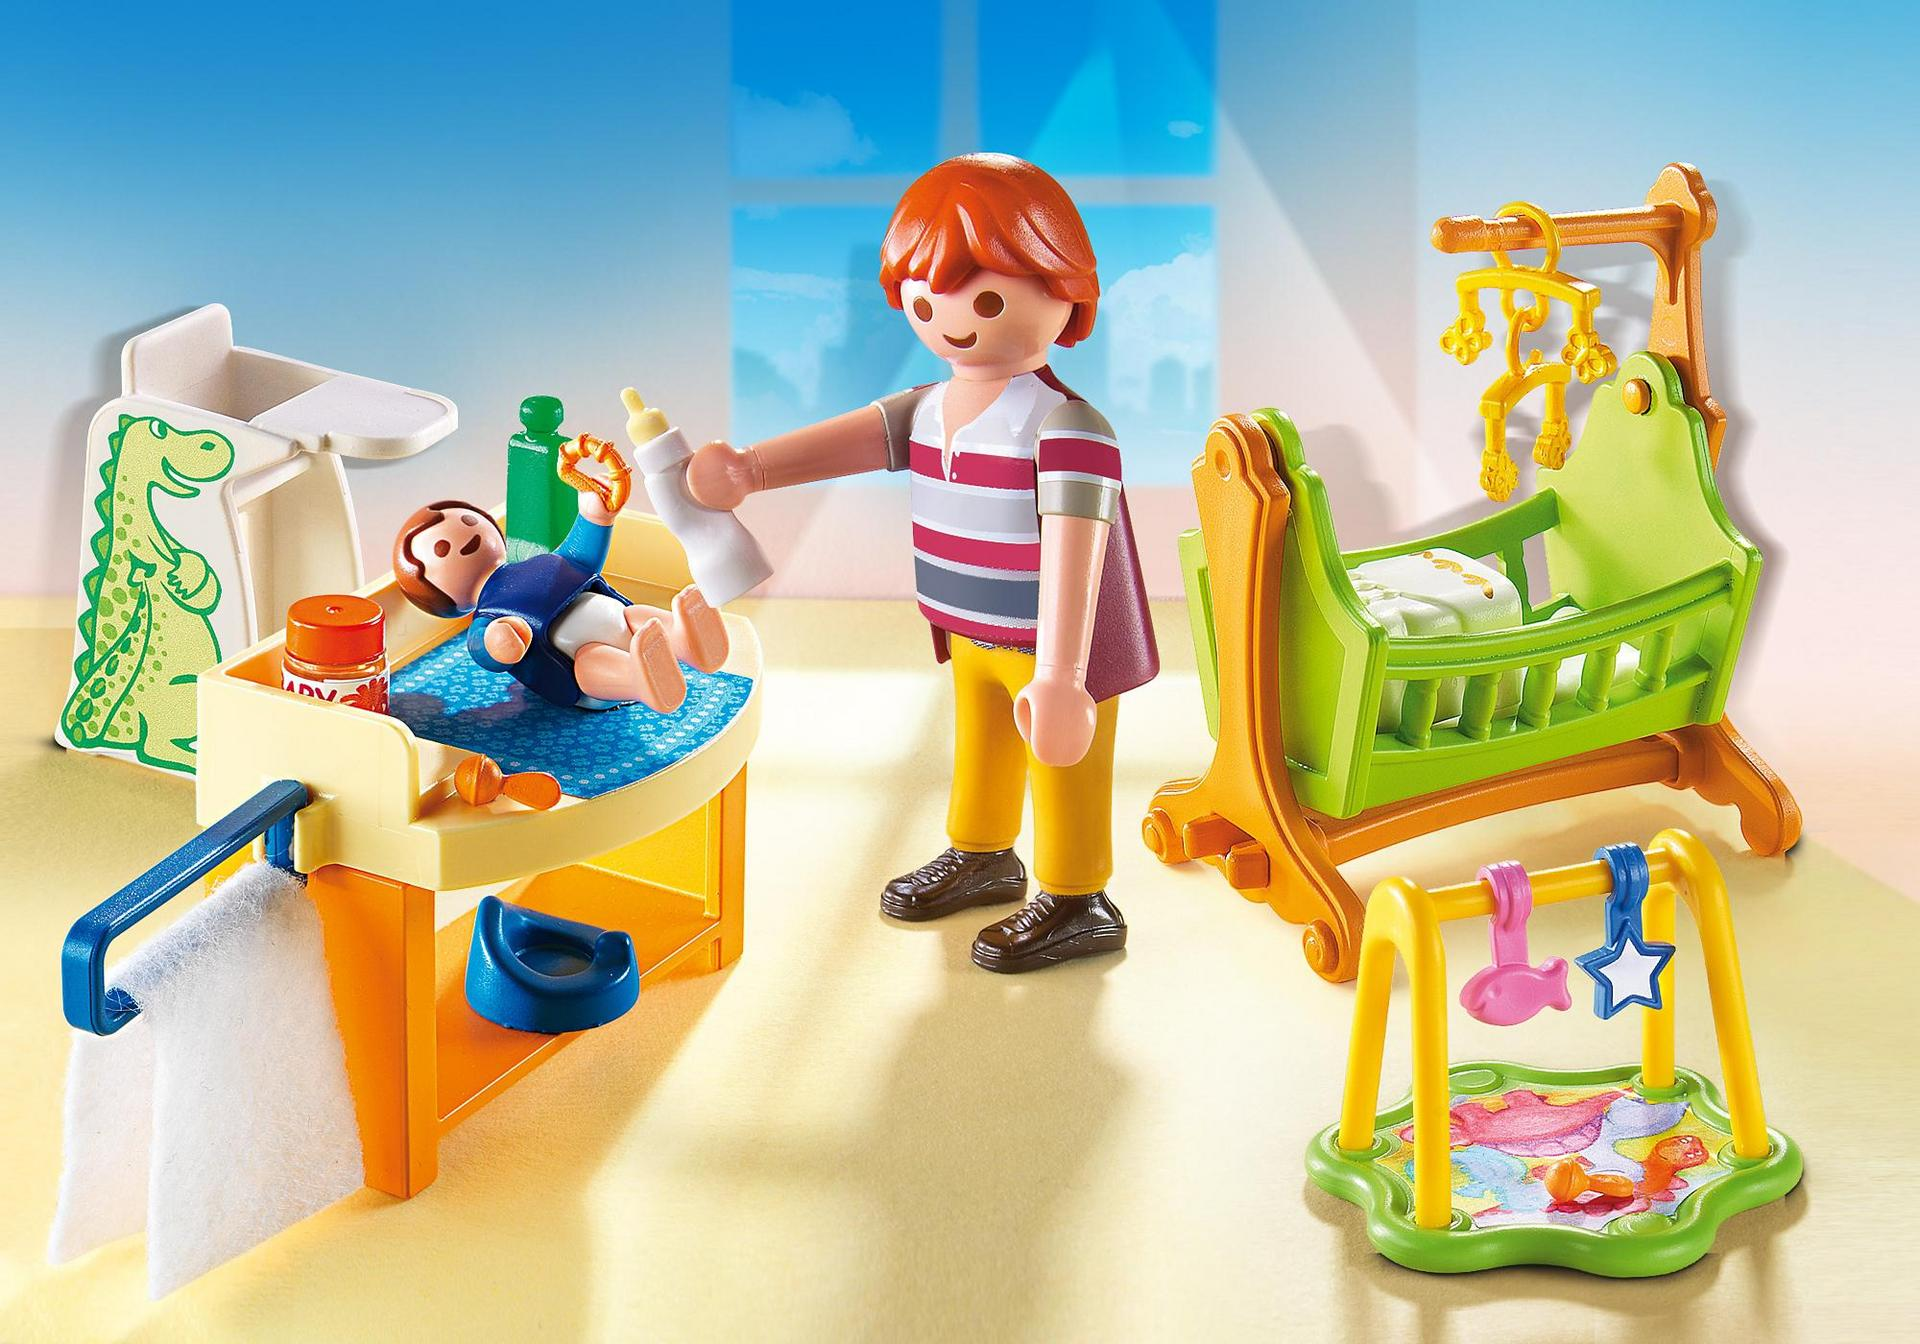 Babykamer met wieg - 5304 - PLAYMOBIL® Nederland